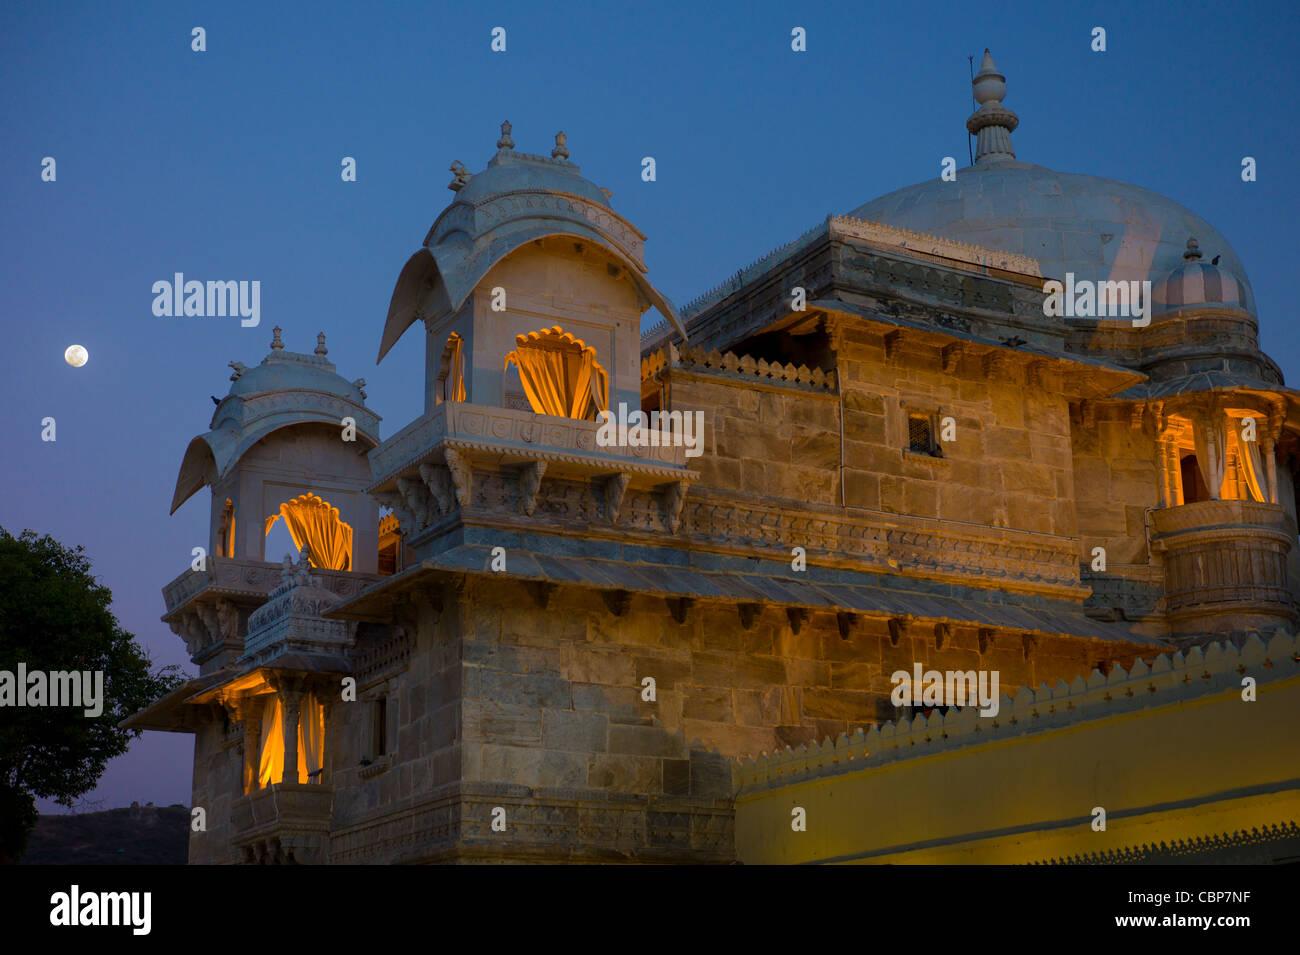 Jagmandir Island Palace of City Palace Complex of 76th Maharana of Mewar, Shreeji Arvind Singh Mewar of Udaipur - Stock Image